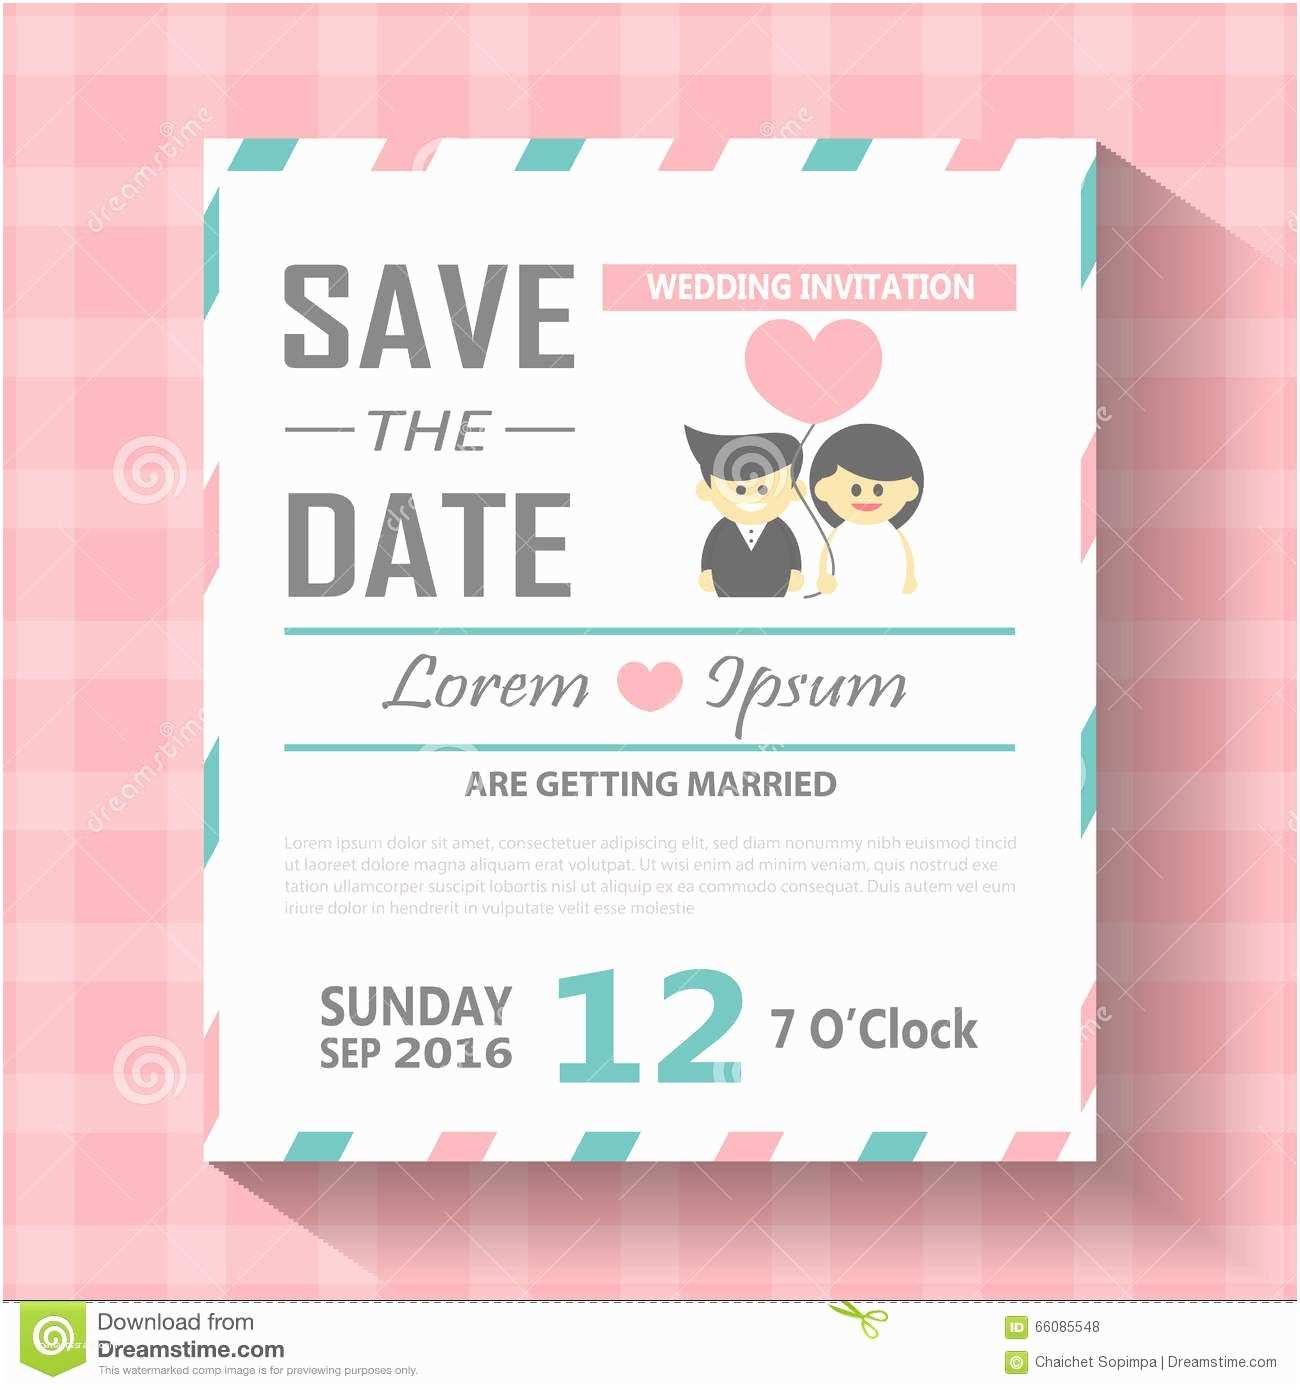 Online Editable Wedding Invitation Cards Free Download Wedding Invitation Card Template Vector